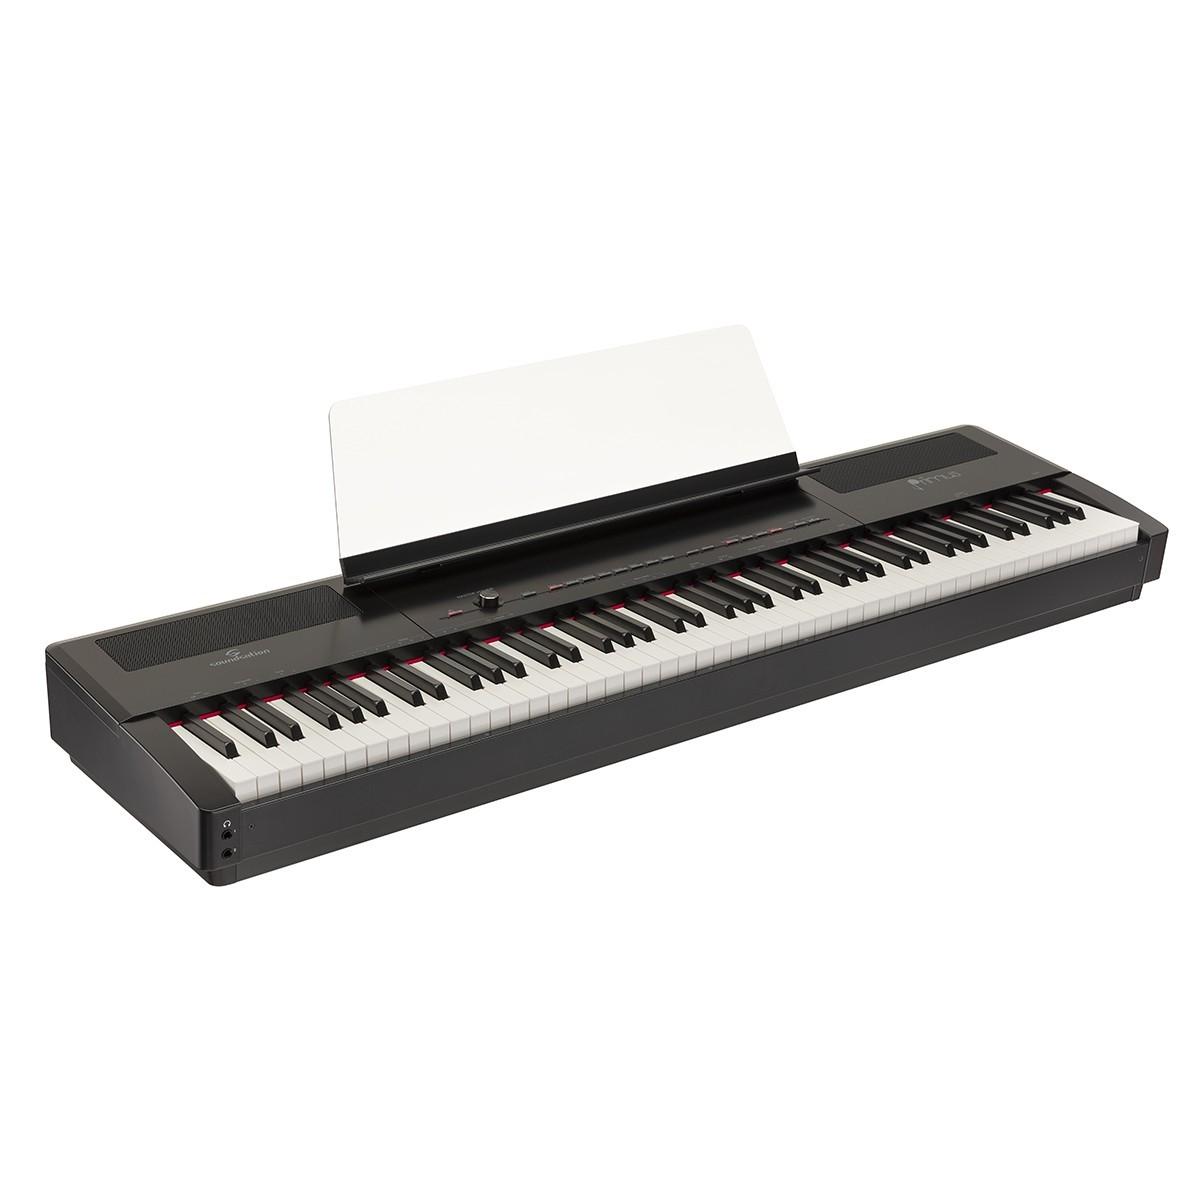 PIANOFORTE DIGITALE SOUNDSATION PRIMUS - 88 TASTI HAMMER ACTION